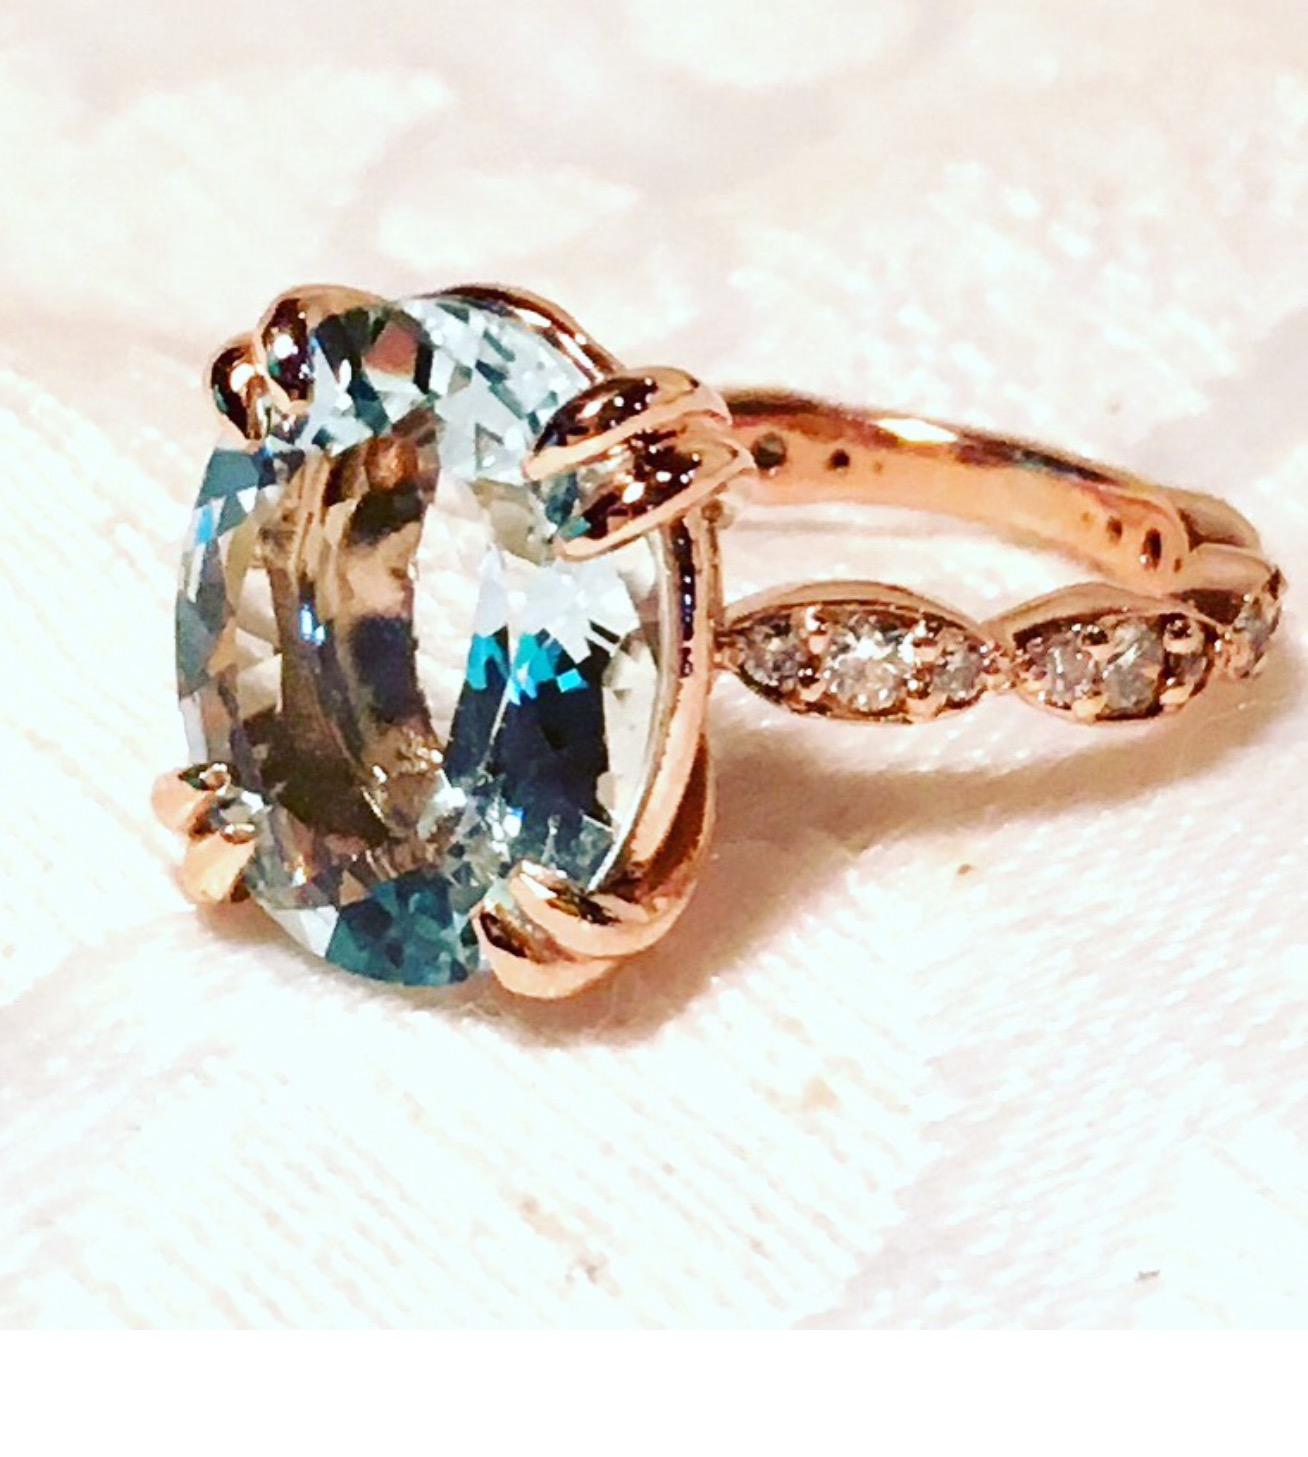 Custom made supplying this 4 carat oval aquamarine stone and designed this 14k rose gold moutning.